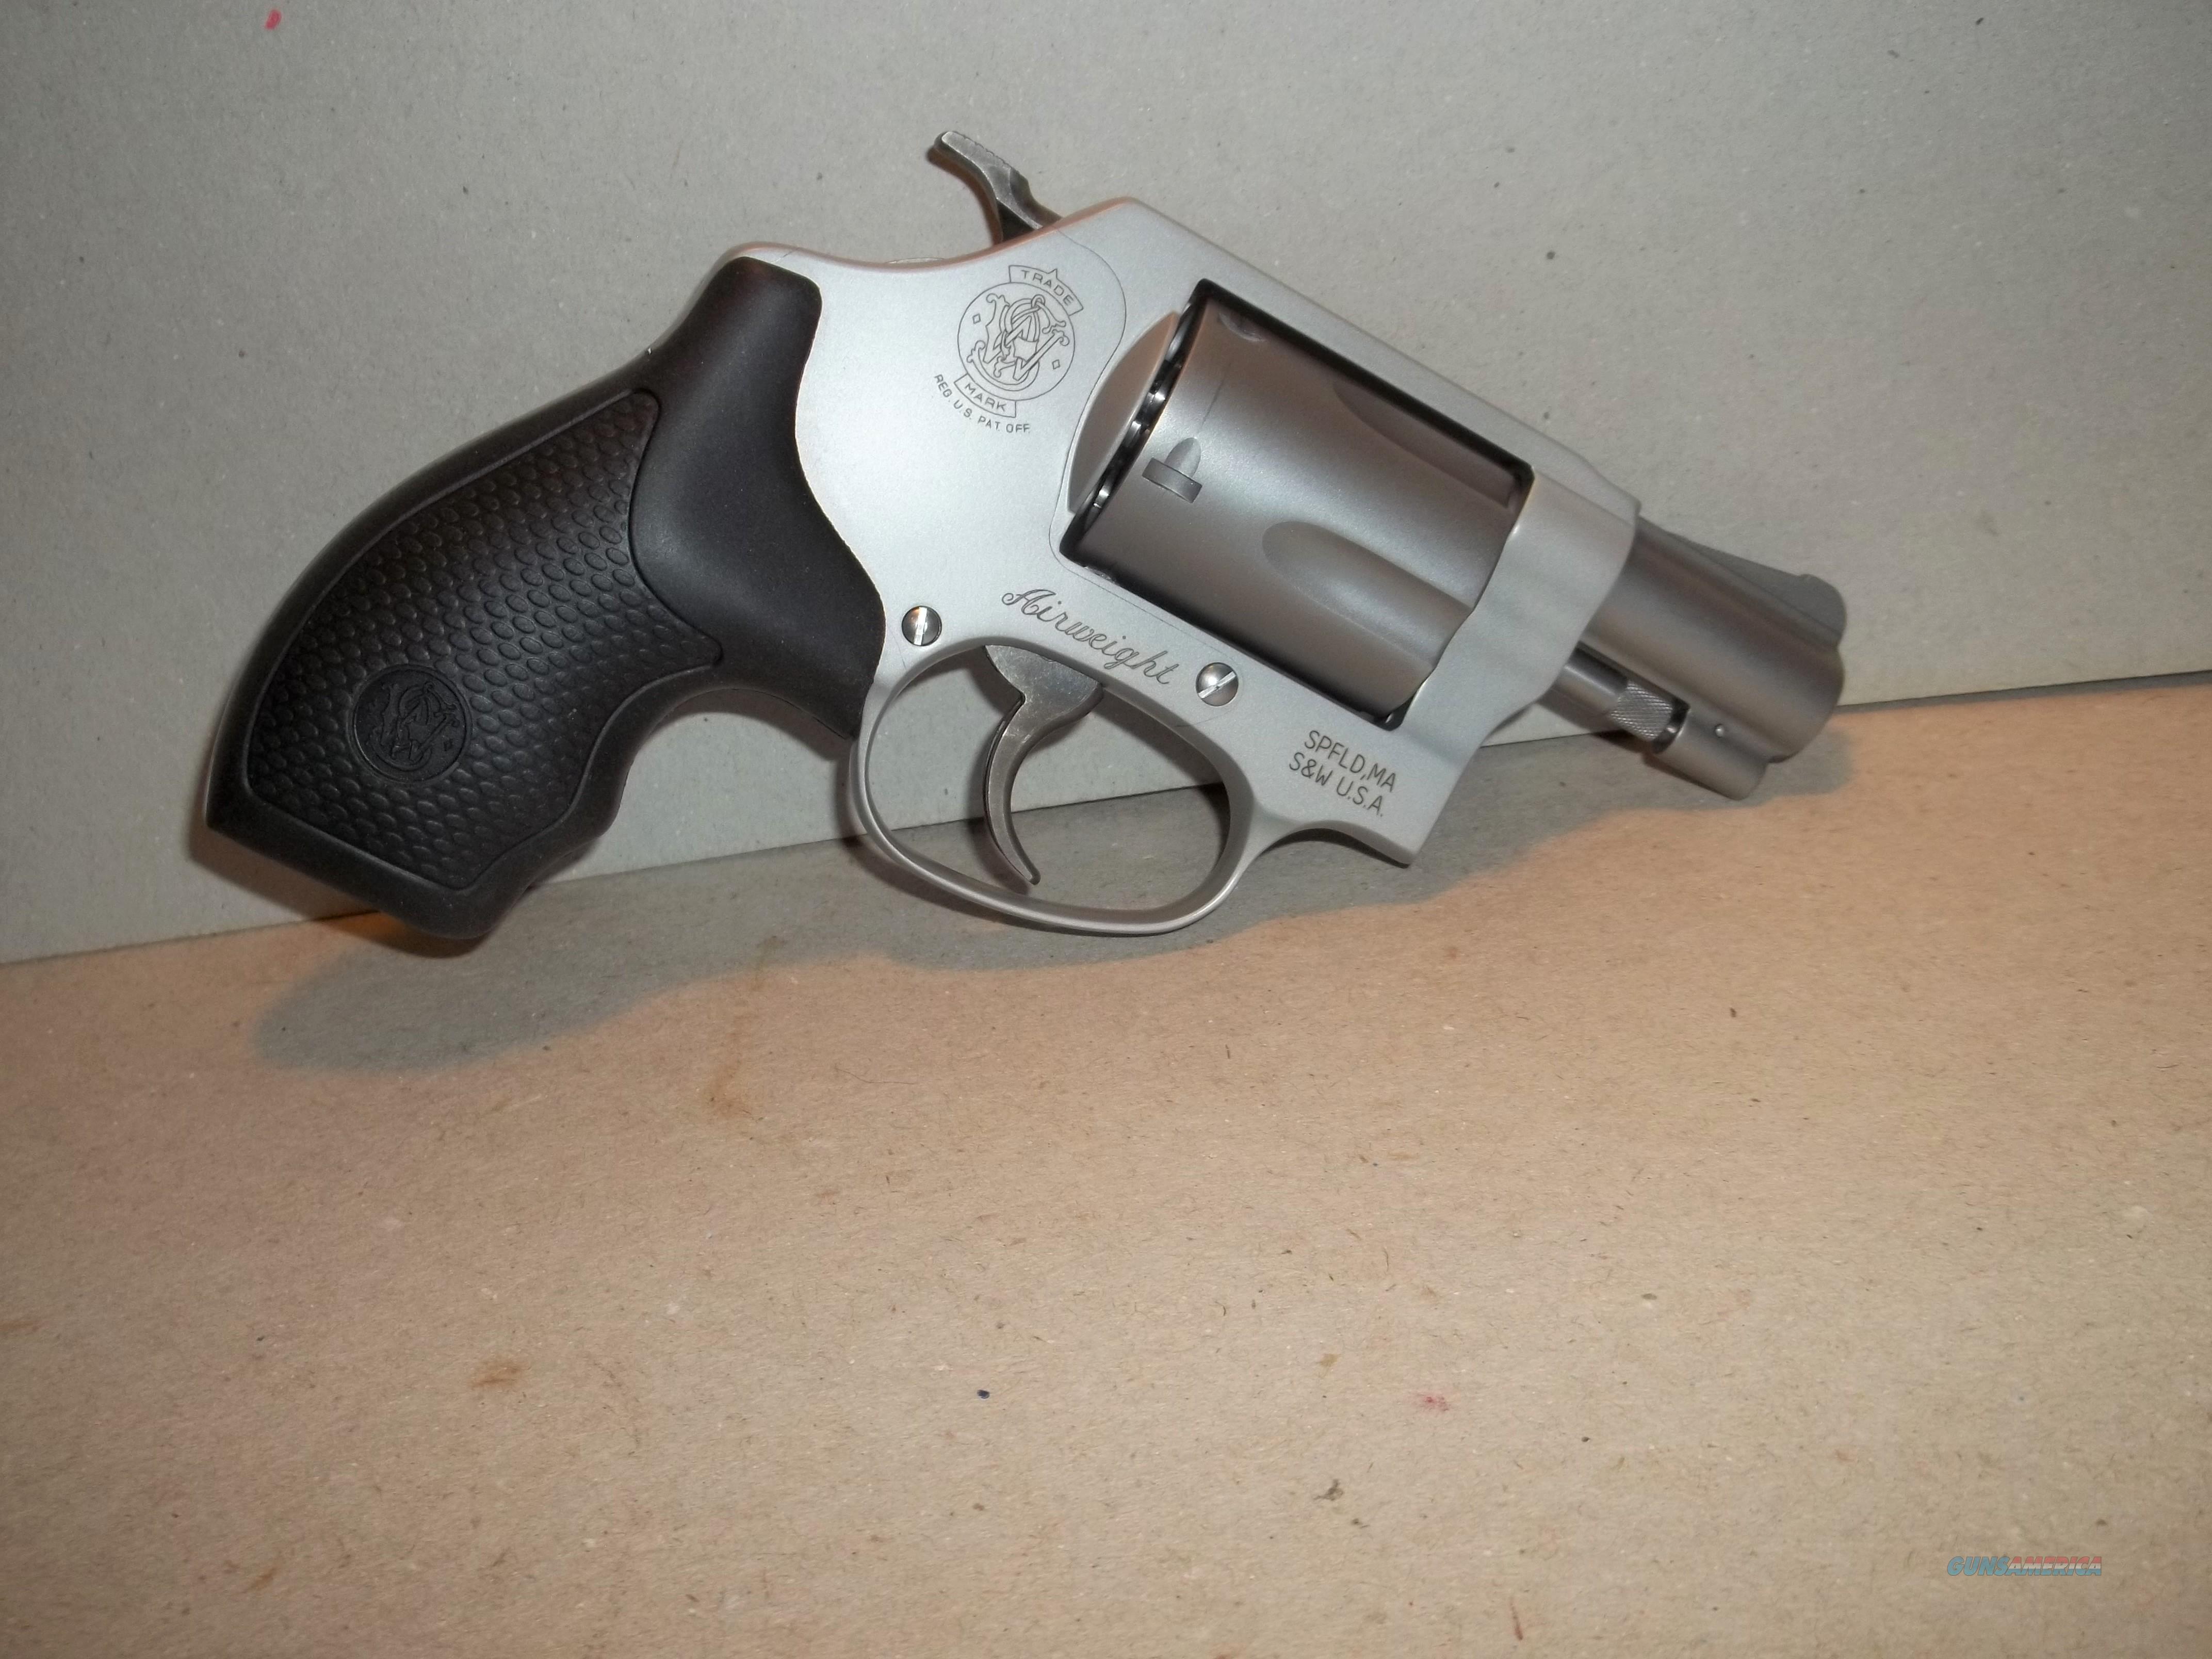 S&W J Frame Model 642 .38spl  Guns > Pistols > Smith & Wesson Revolvers > Small Frame ( J )